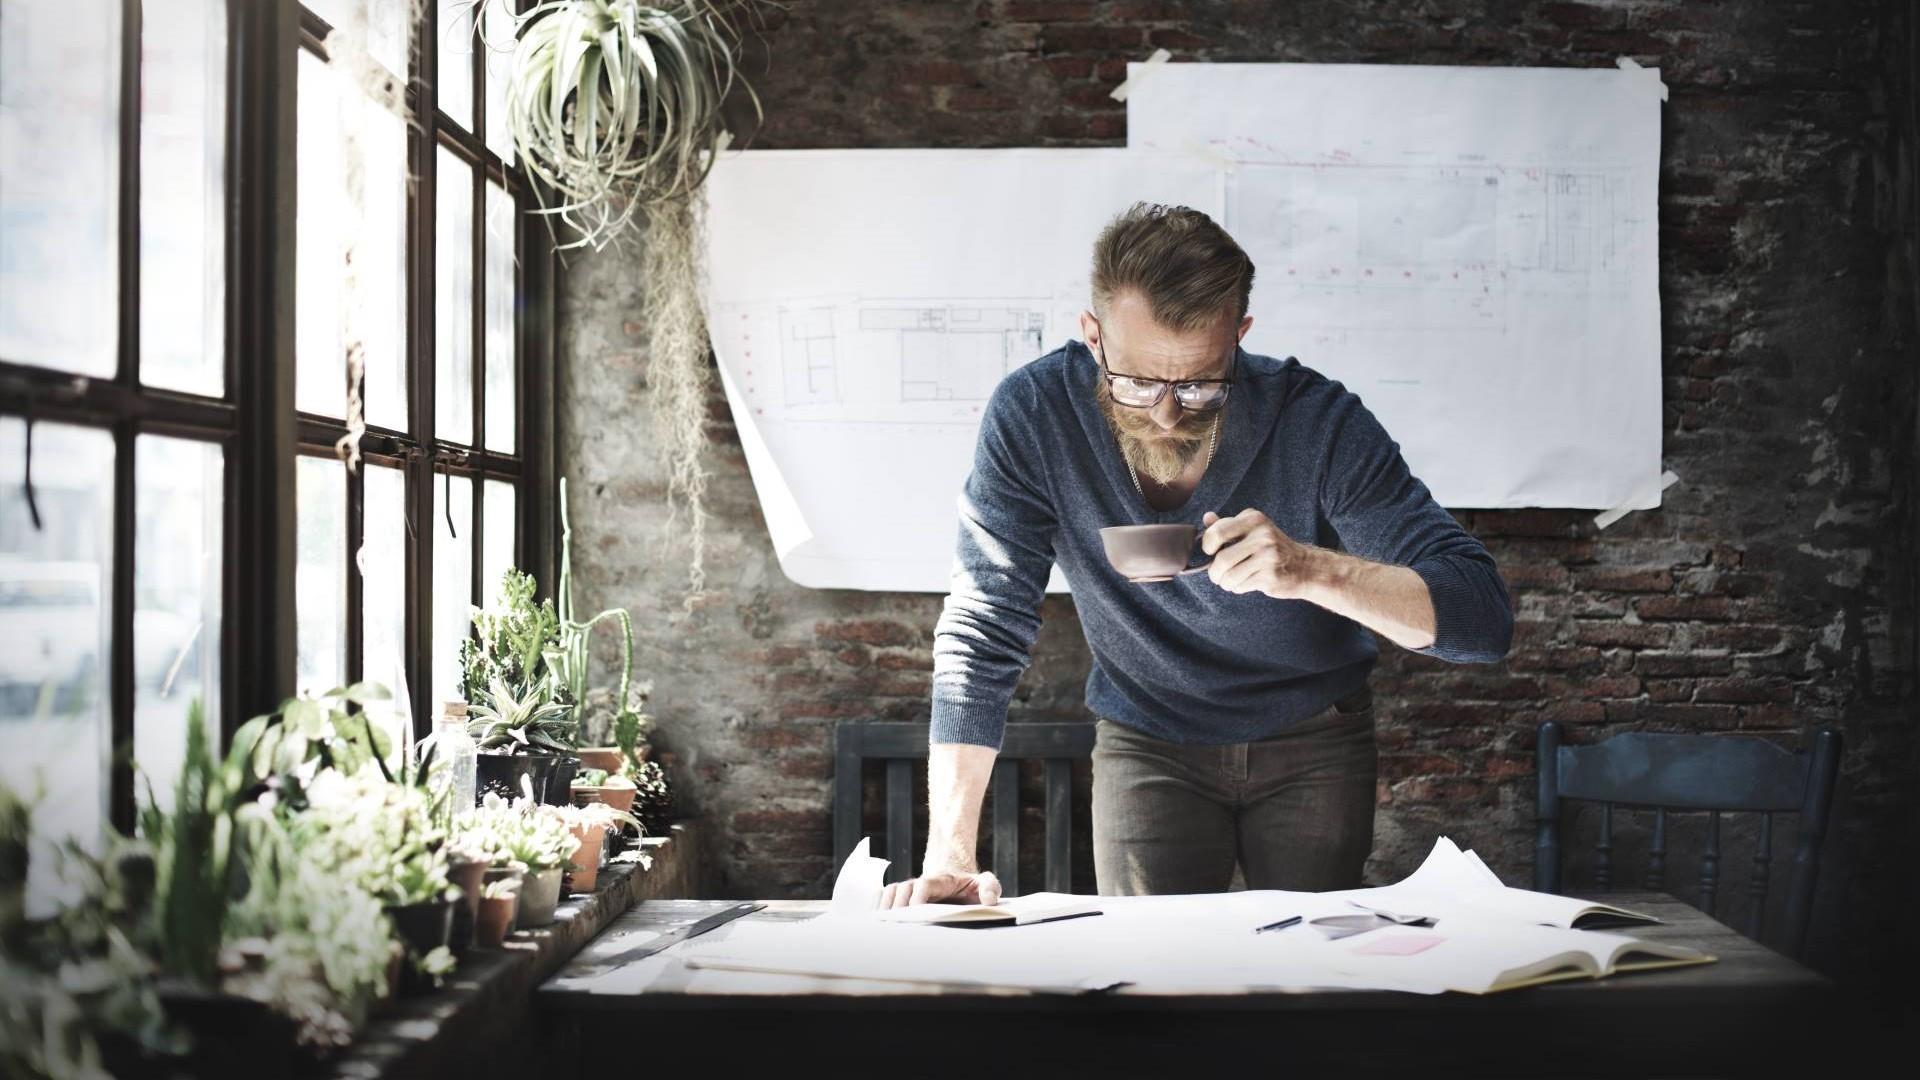 man2 - Architect Engineer Design Working Planning Concept